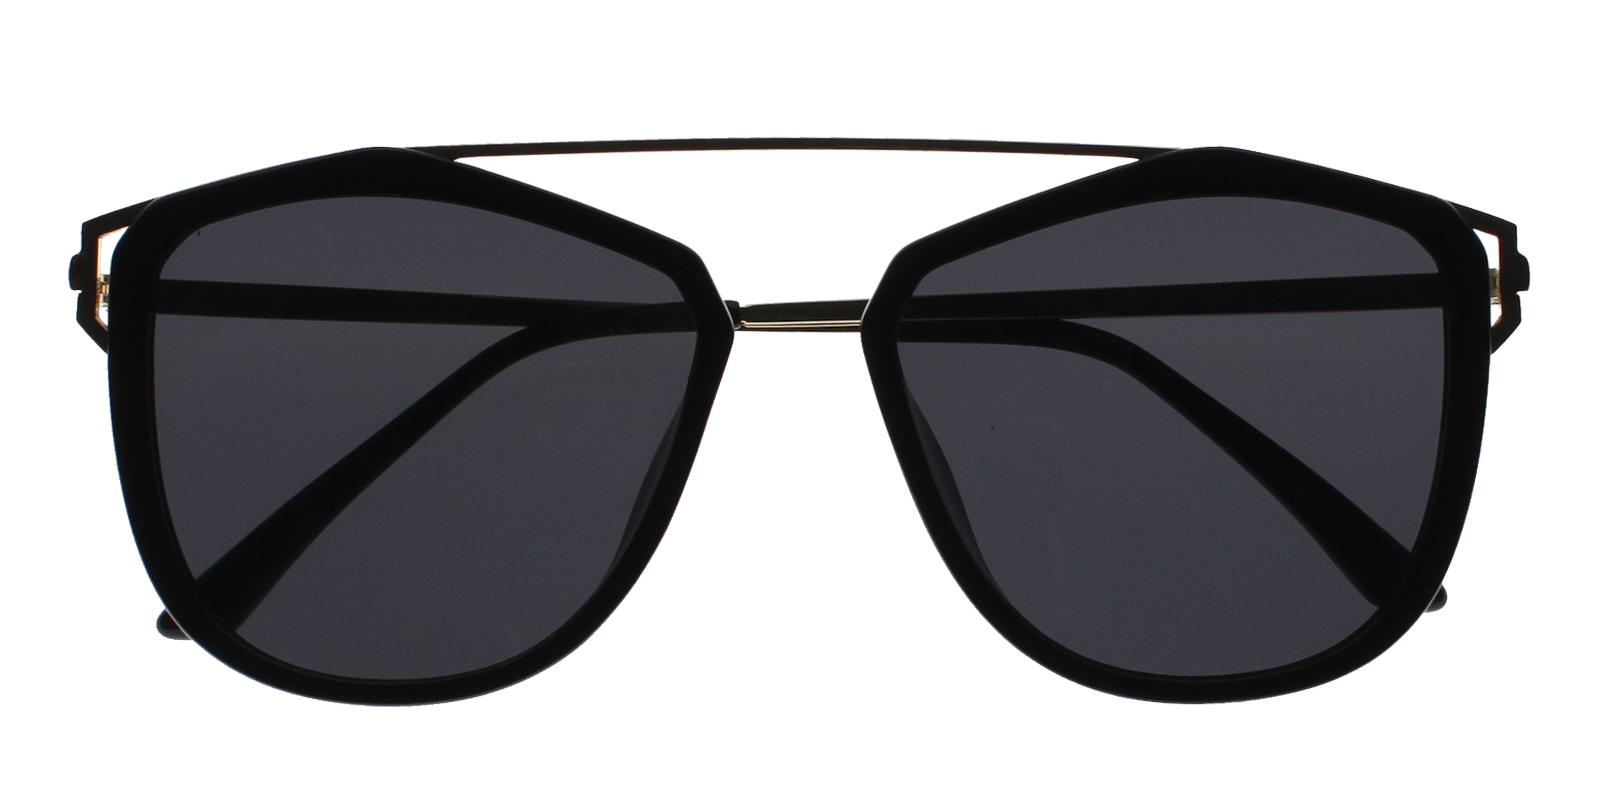 Lydia Black Metal , Combination , TR Sunglasses , UniversalBridgeFit Frames from ABBE Glasses